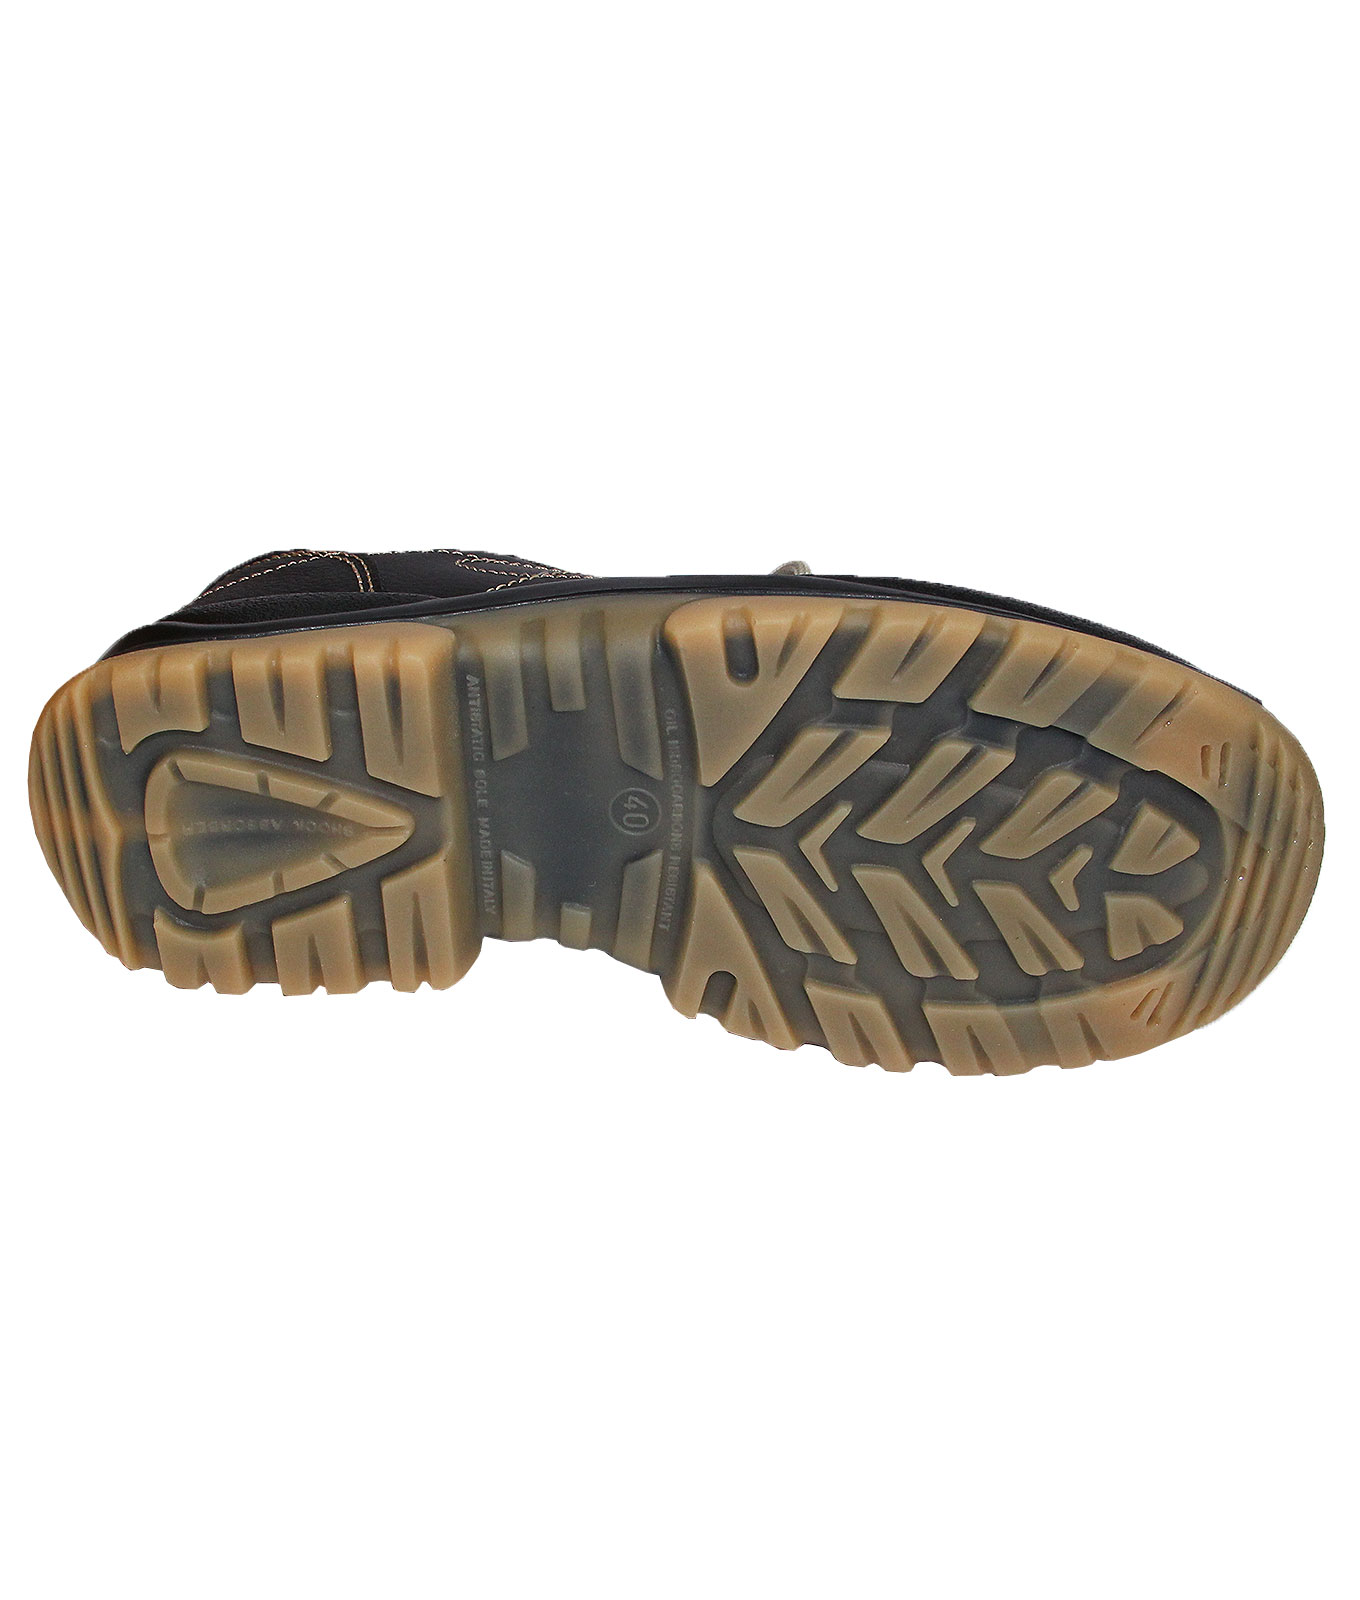 Tropea παπούτσια εργασίας 5